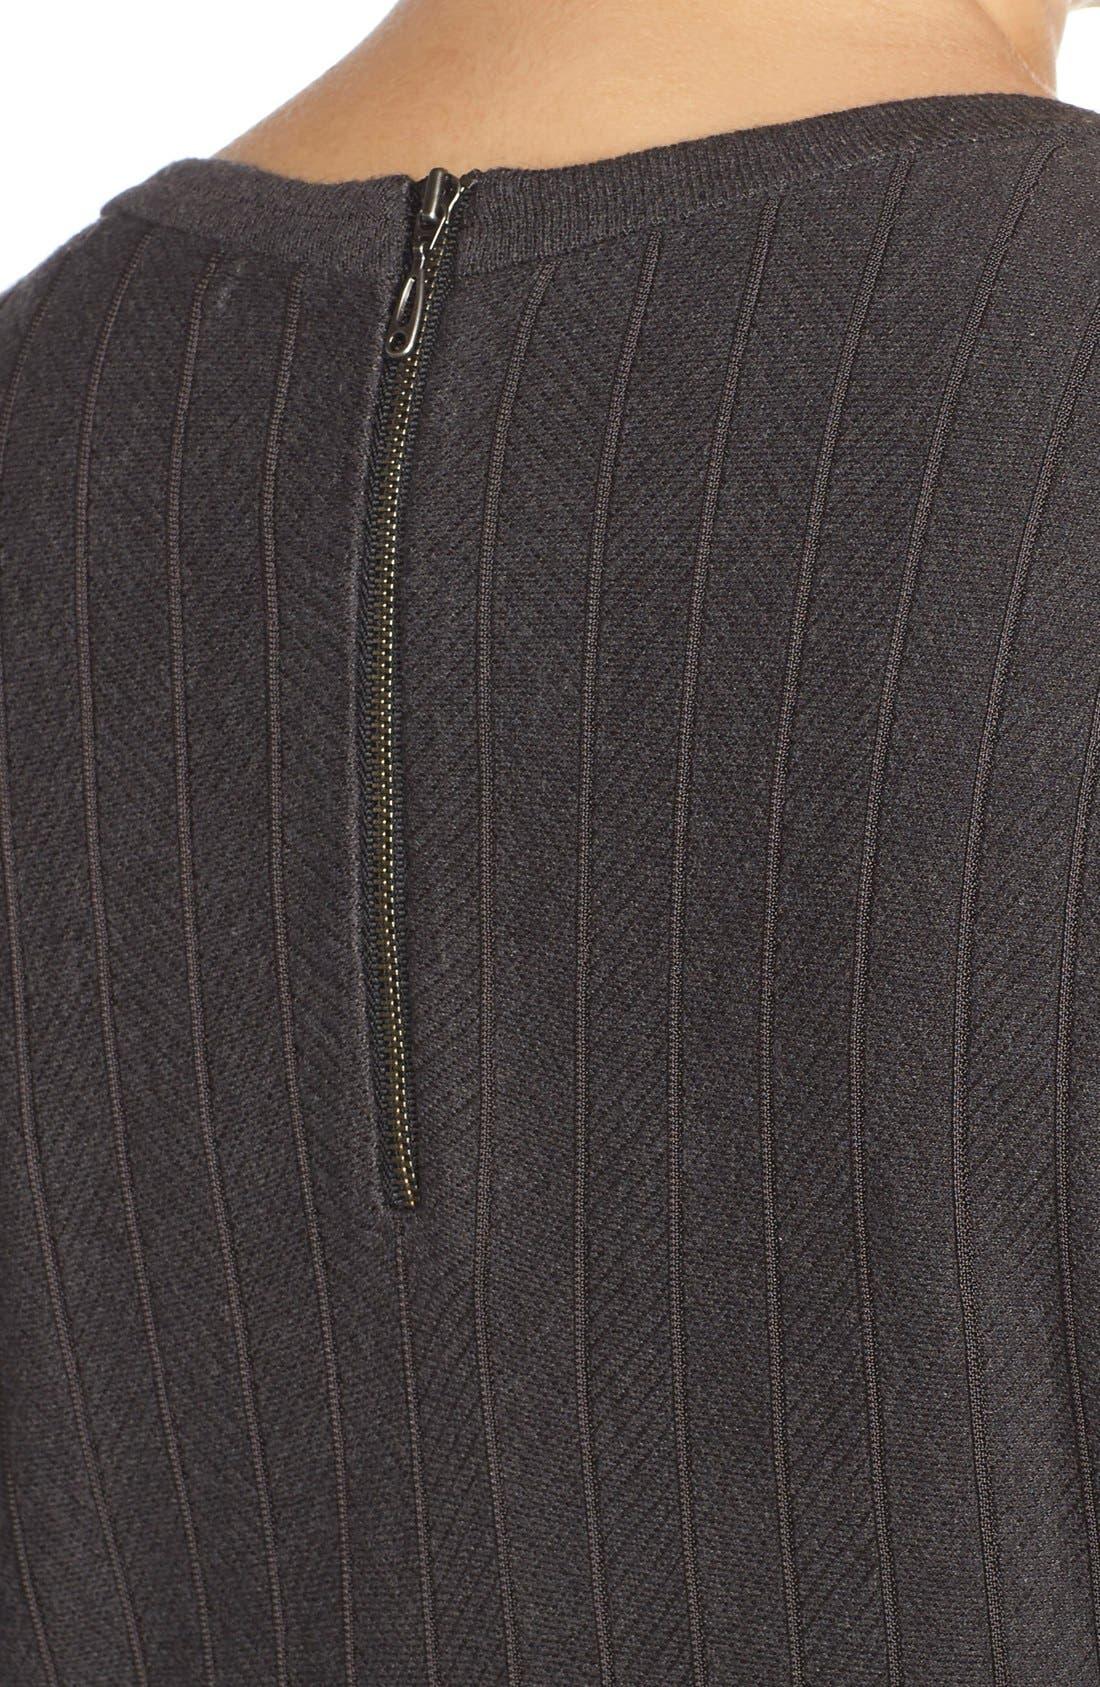 'Twirl' Elbow Sleeve Knit Fit & Flare Dress,                             Alternate thumbnail 4, color,                             Phantom Heather